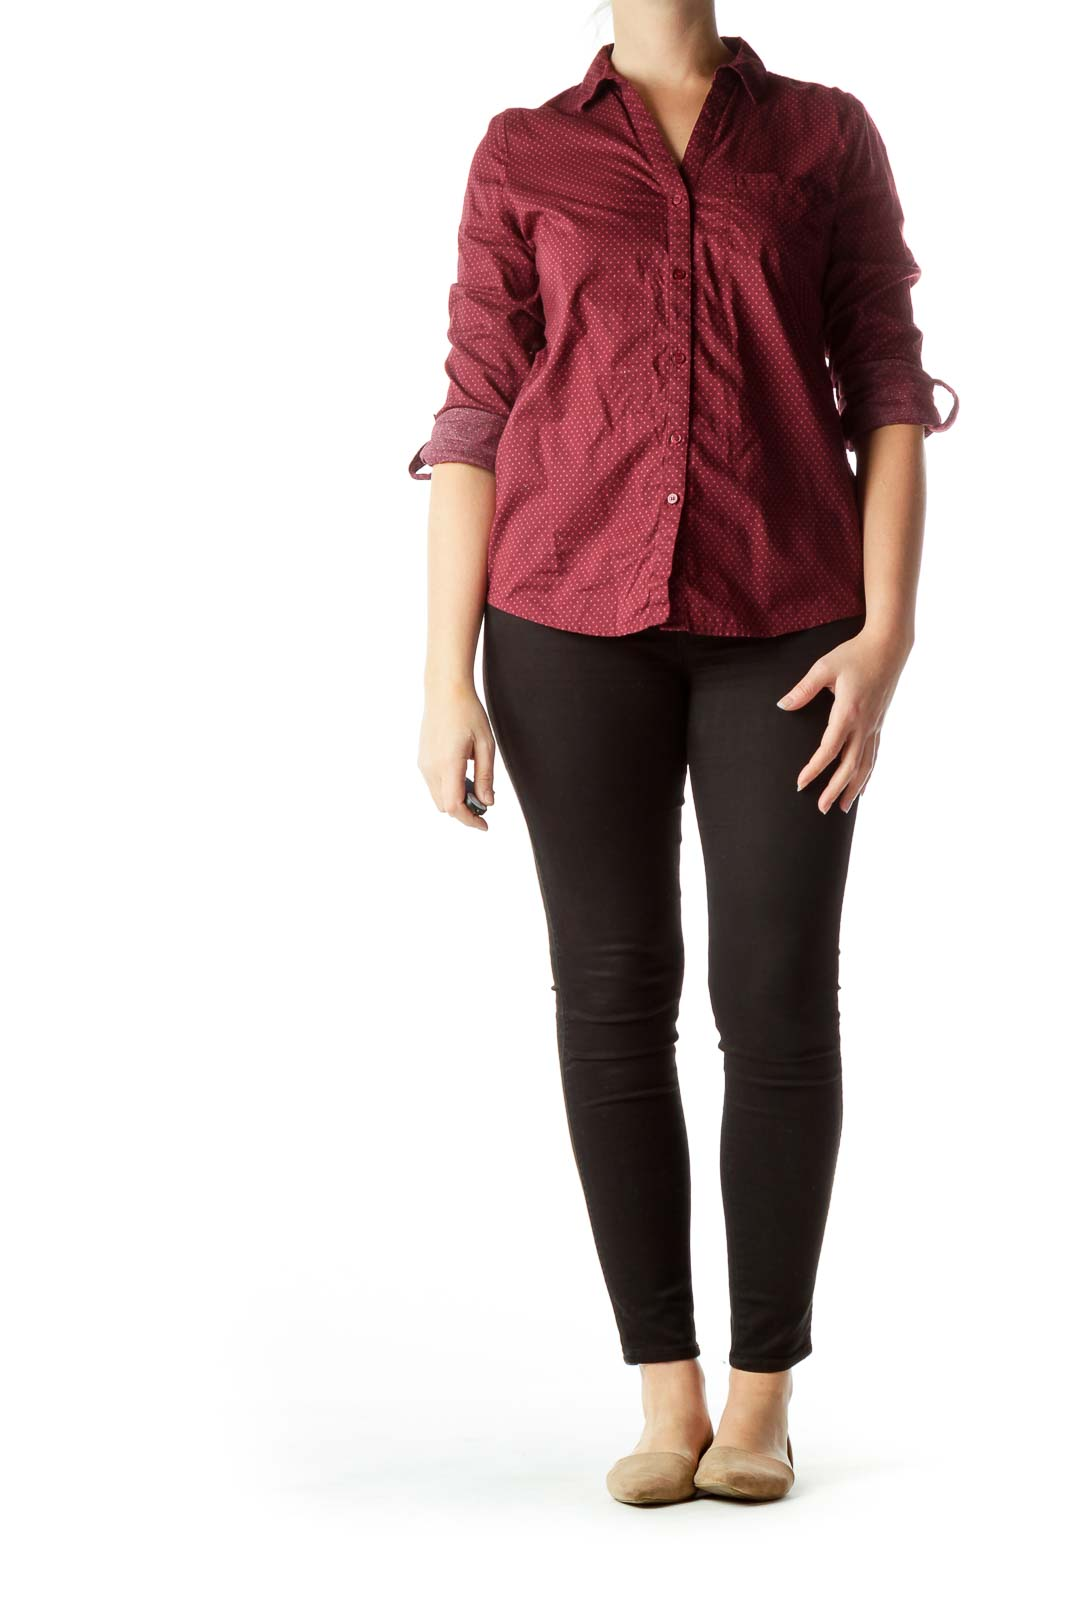 Burgundy Polka-Dot 100% Cotton Shirt